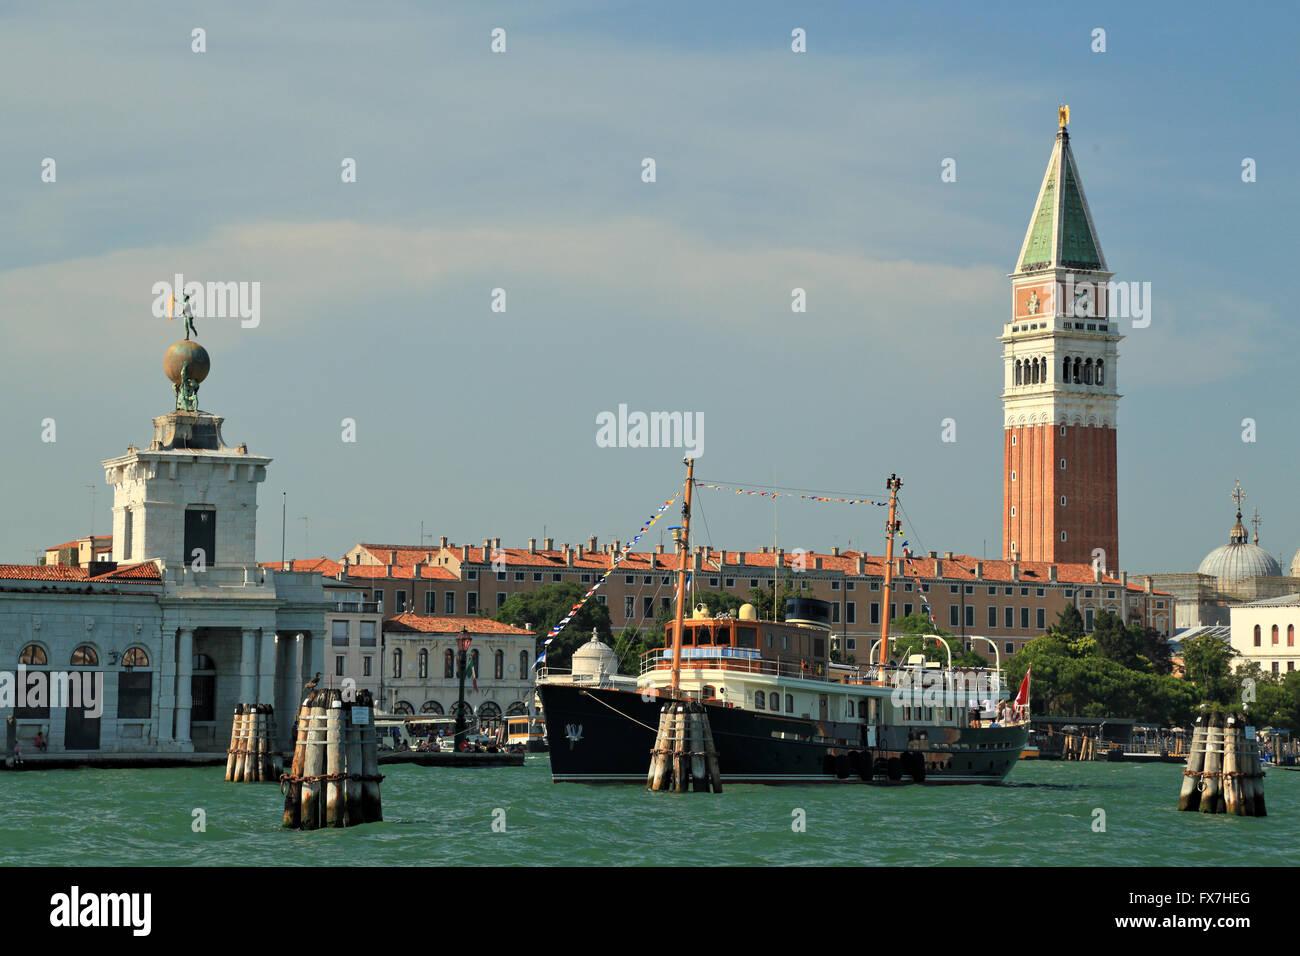 Luxury motor yacht Taransay, IMO 9776054 in Venice - Stock Image